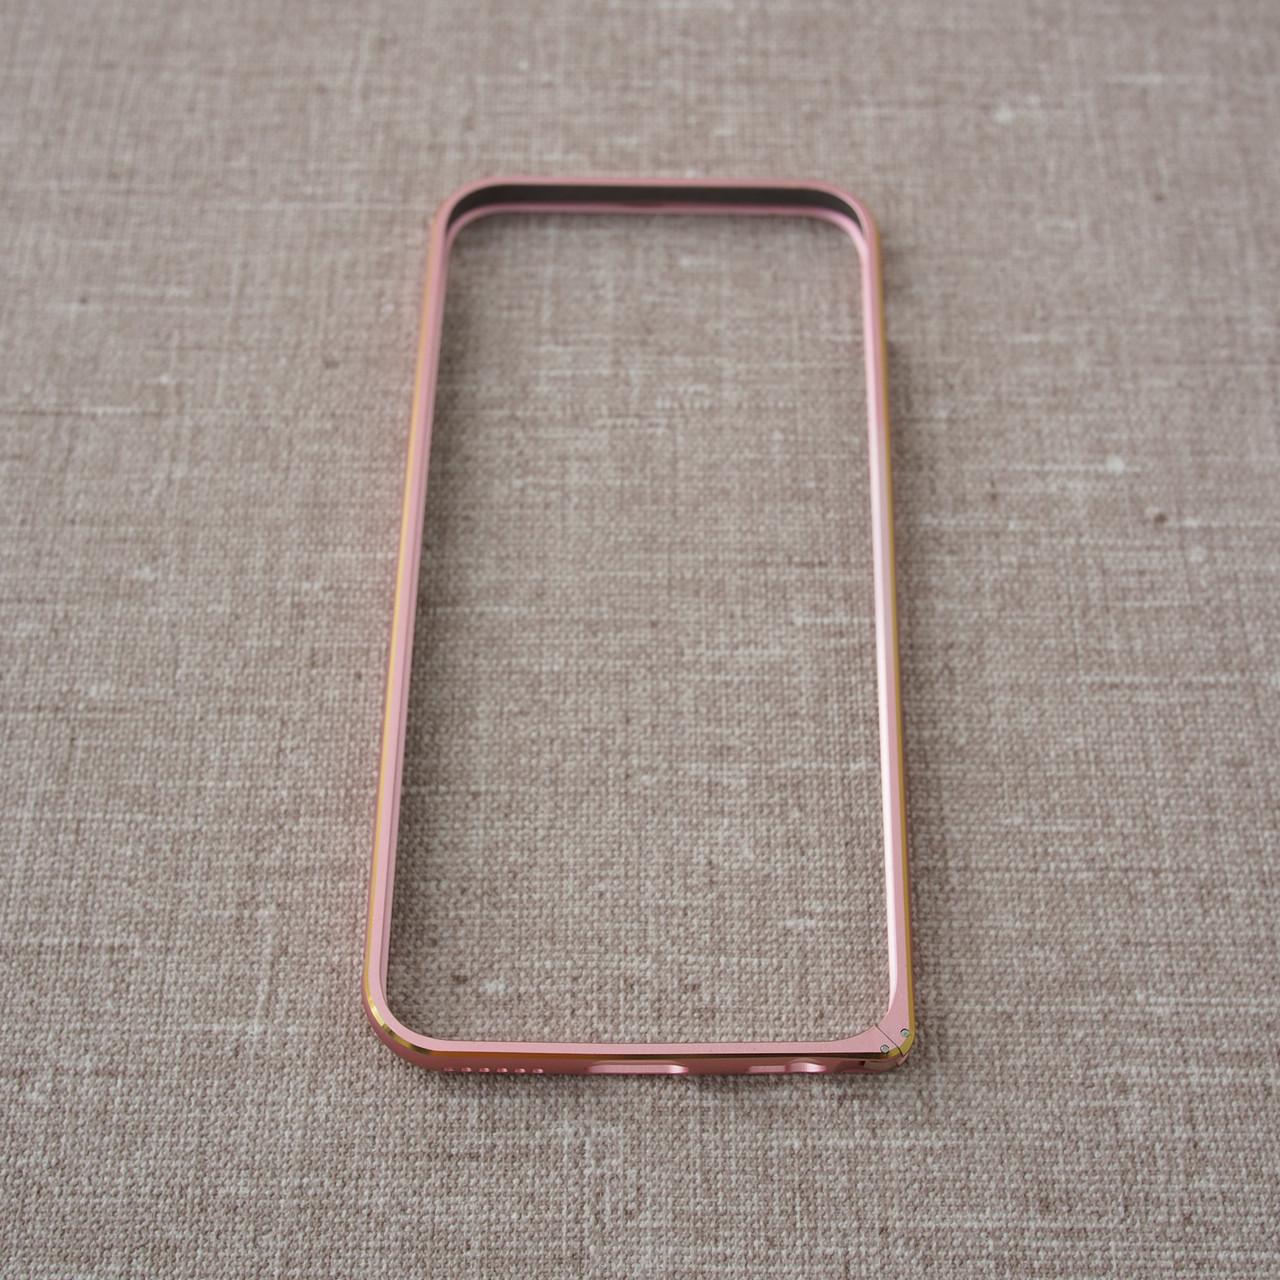 Бампер метал. Nillkin Gothic iPhone 6 pink EAN / UPC: 6956473290674